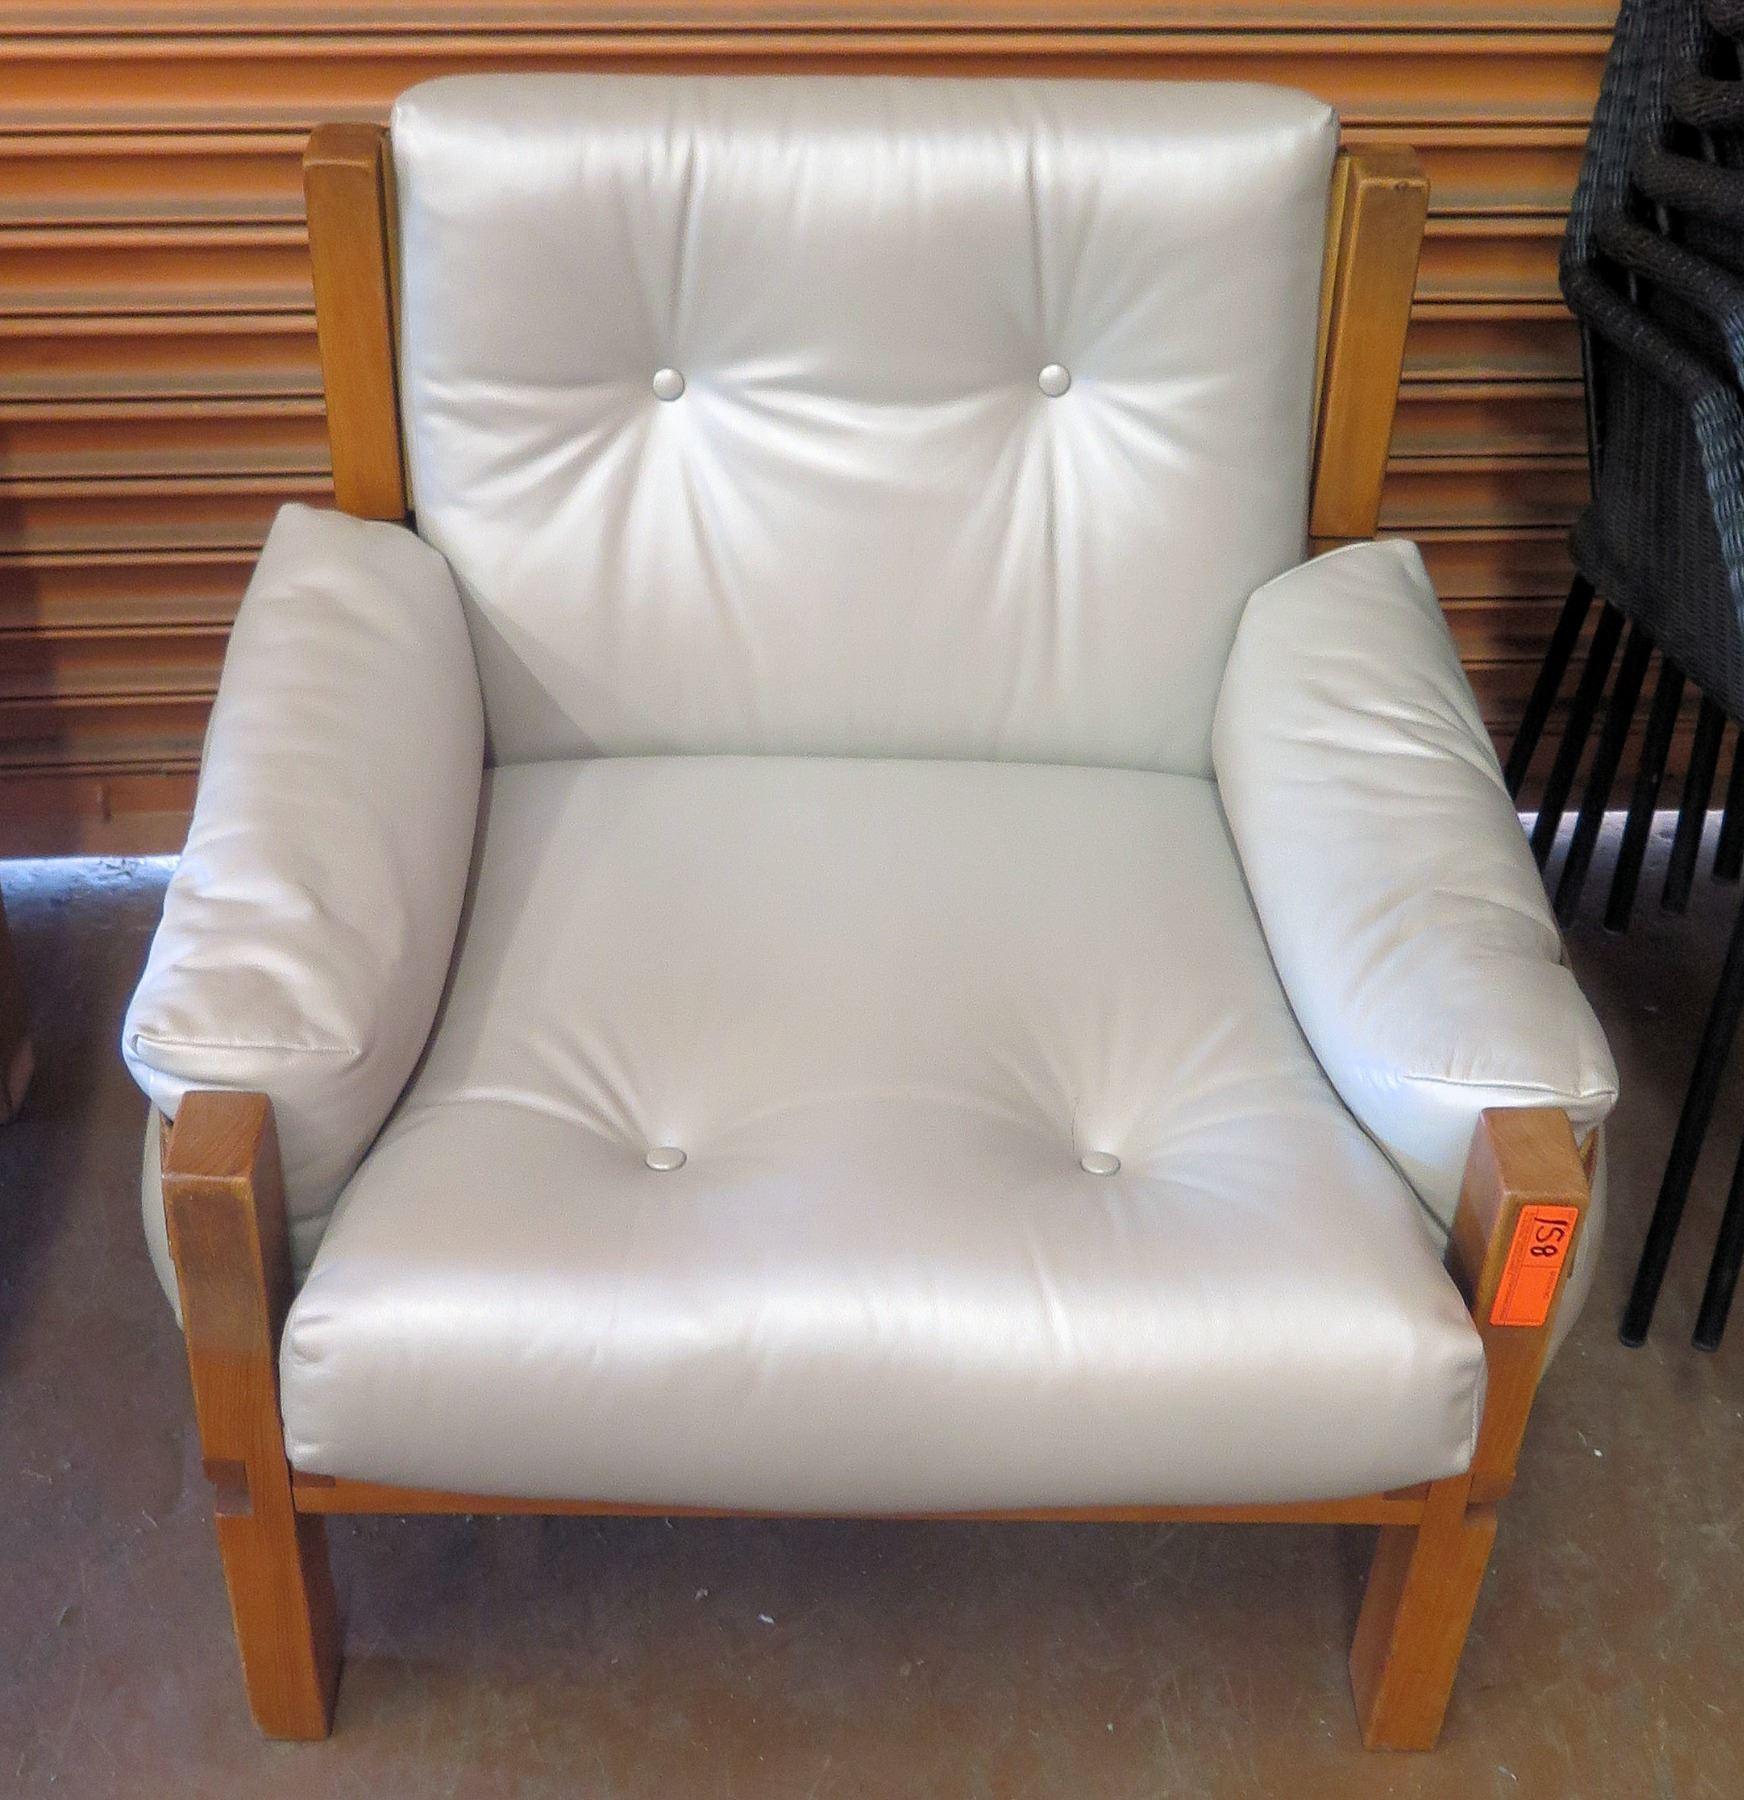 Excellent Lt Grey Leather Armchair W Wood Frame Leather Accent Machost Co Dining Chair Design Ideas Machostcouk